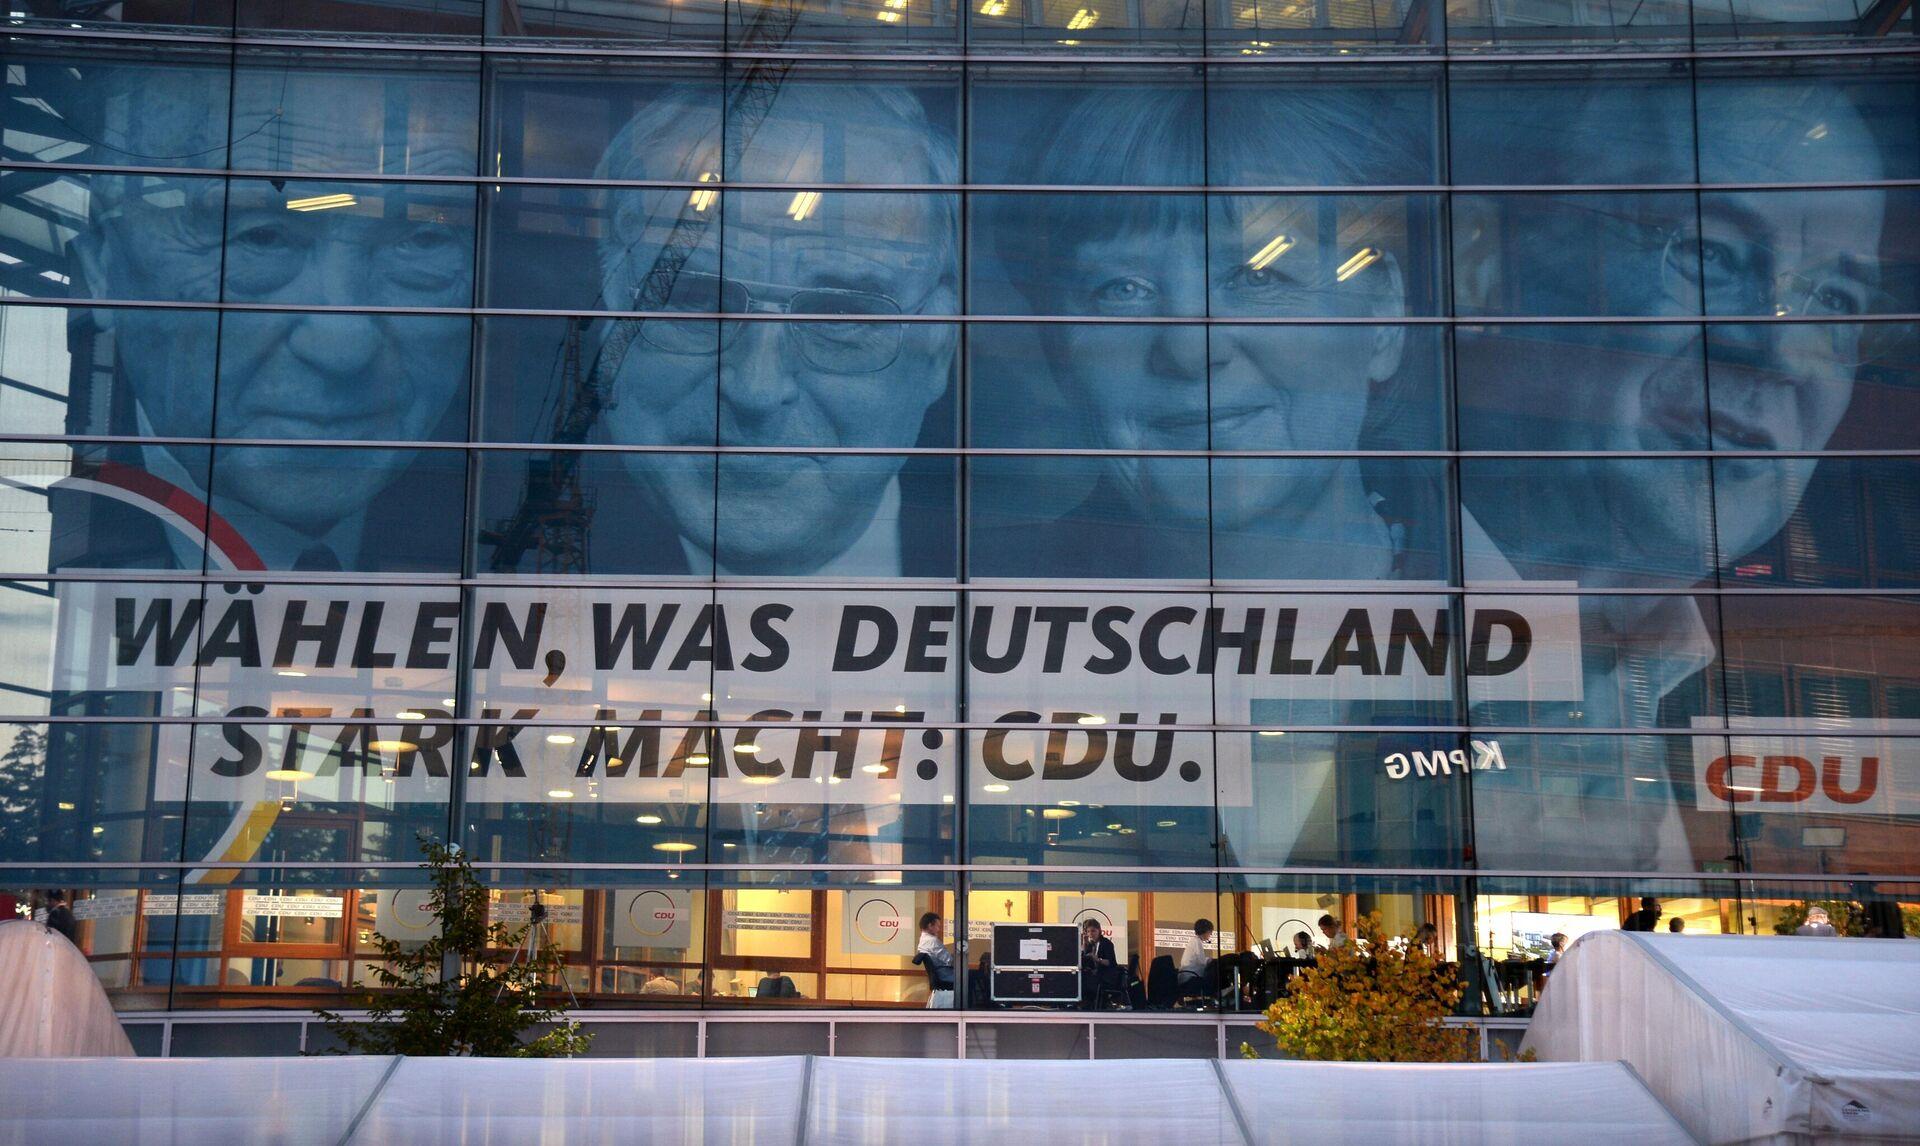 Un manifesto elettorale della CDU che raffigura Angela Merkel accanto ad Helmut Kohl - Sputnik Italia, 1920, 11.10.2021